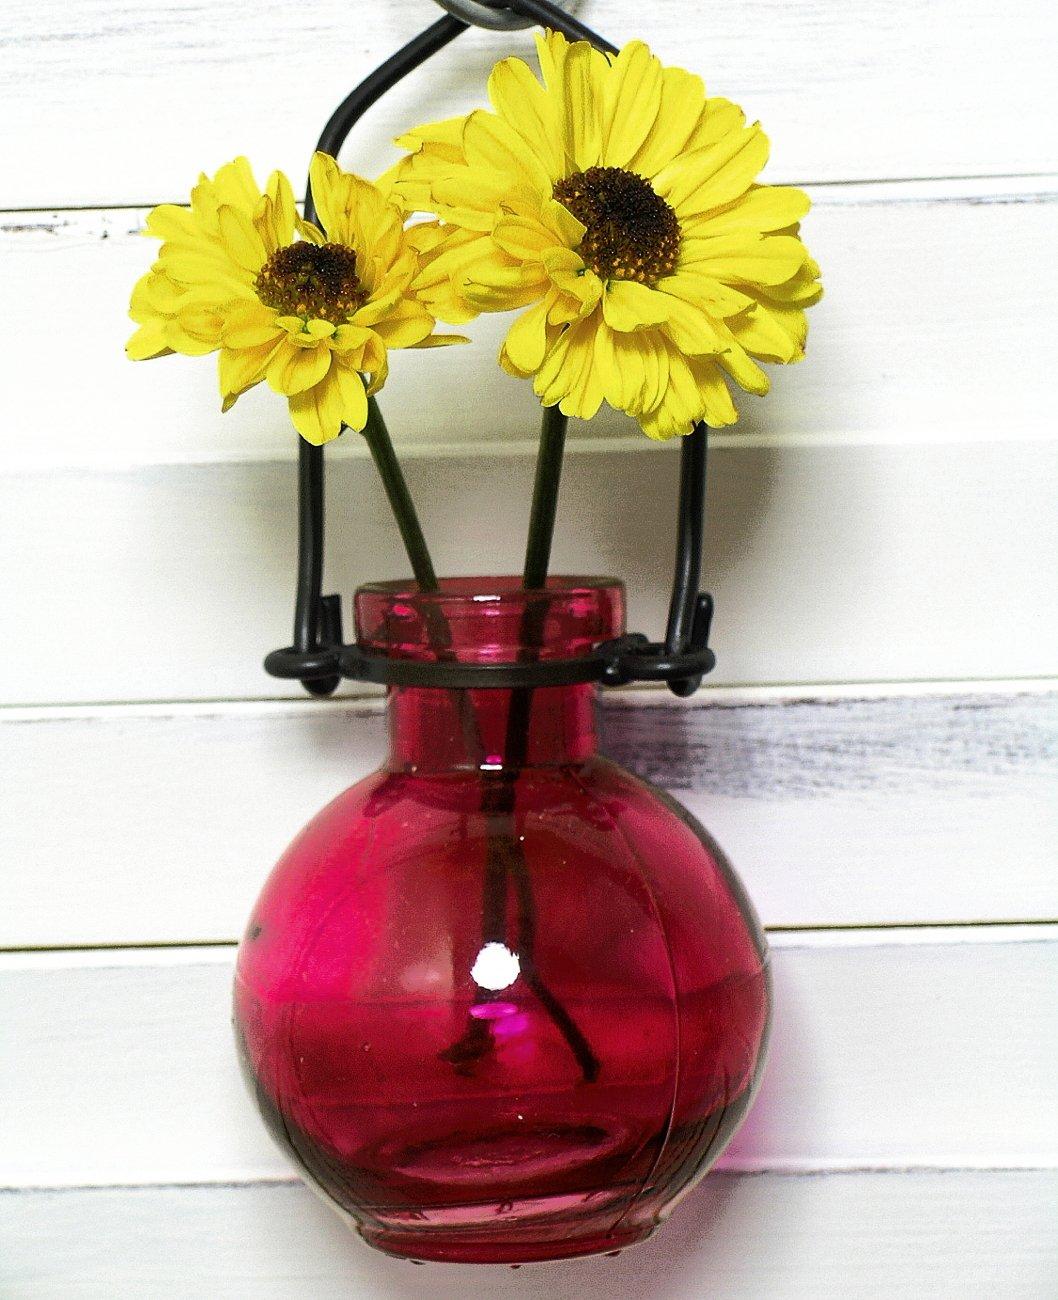 Amazon hanging flower glass wall vase 1pc g73 red glass amazon hanging flower glass wall vase 1pc g73 red glass bottle floral vase colored vase bud vase garden vase home kitchen reviewsmspy